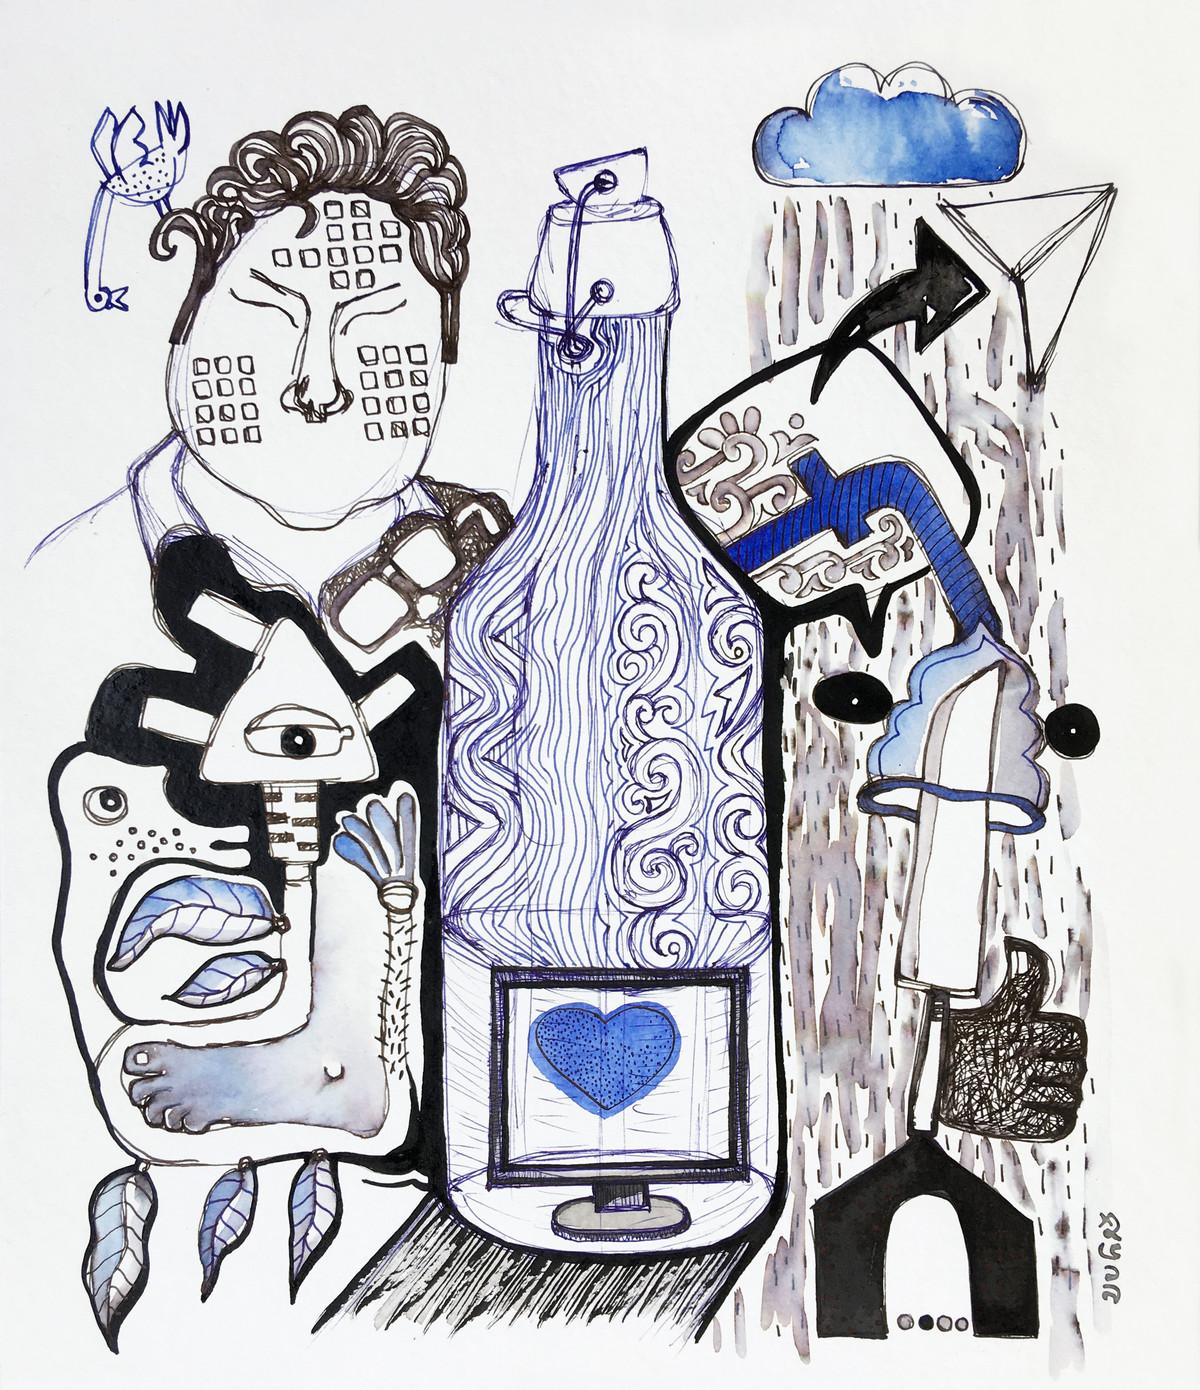 The Struggling Elite by Shubharanjan Paul, Illustration Drawing, Pen & Ink on Paper, Tuna color